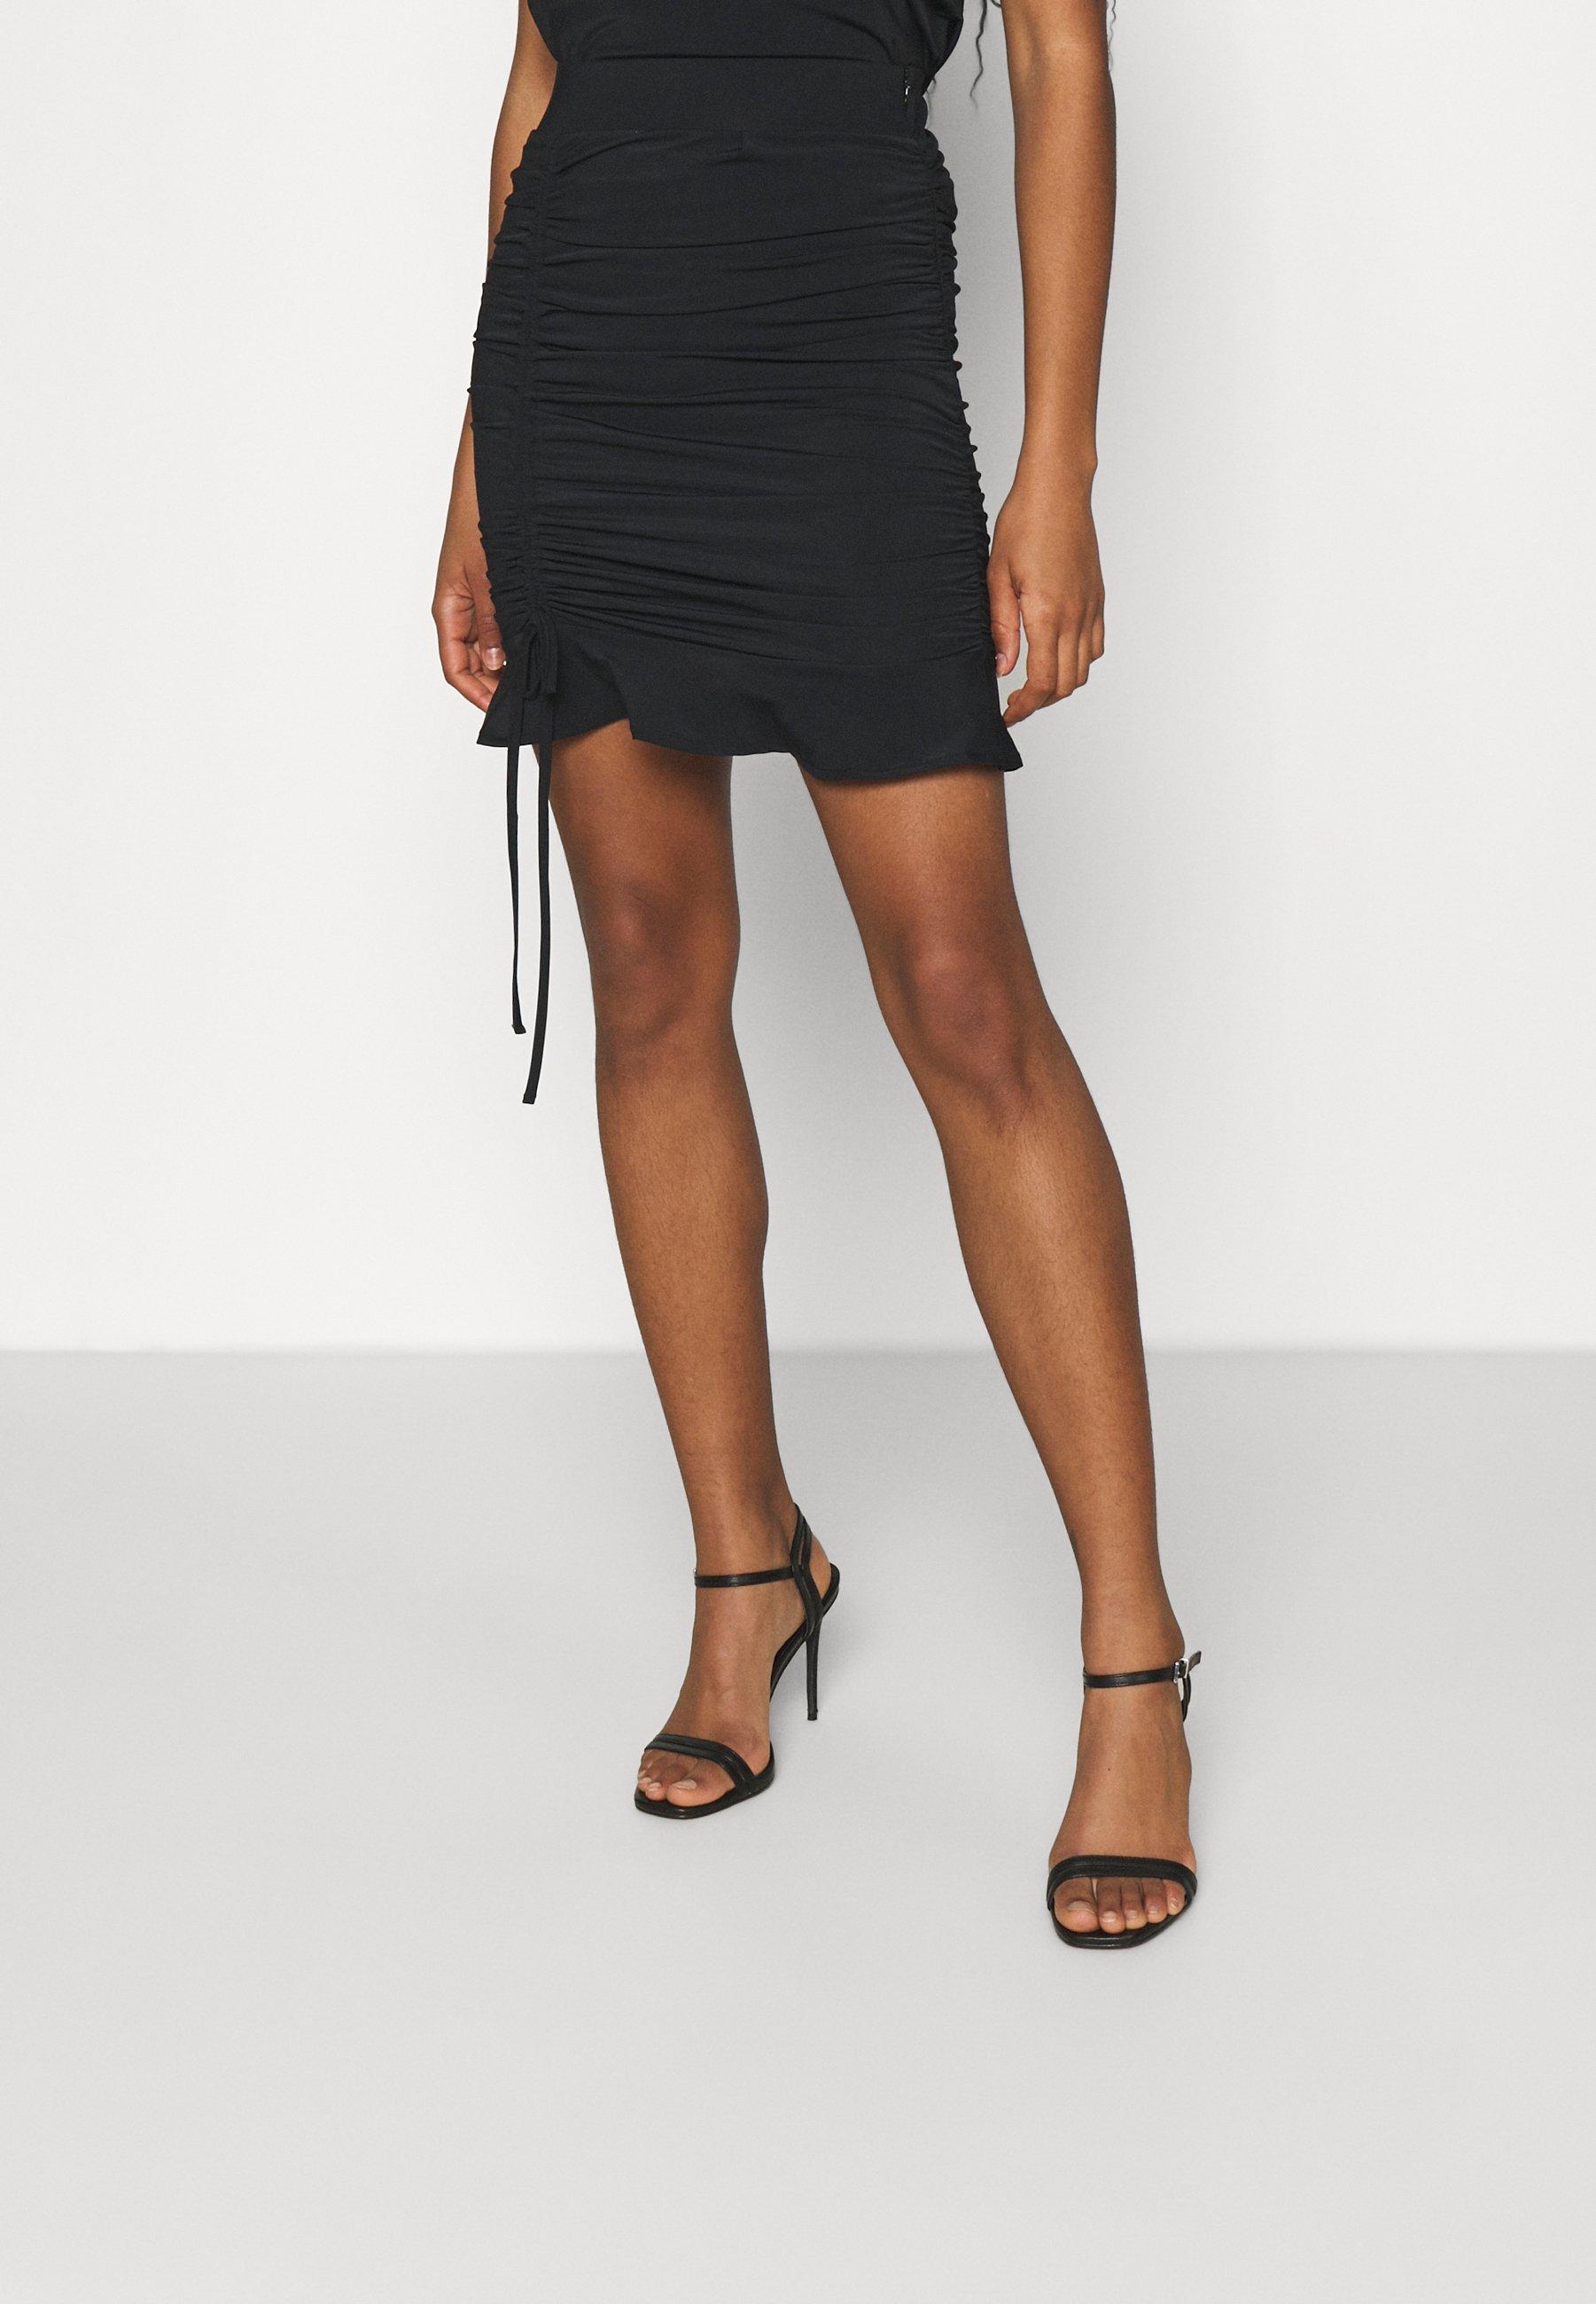 Mujer SUZY ROUCHED SKIRT - Minifalda